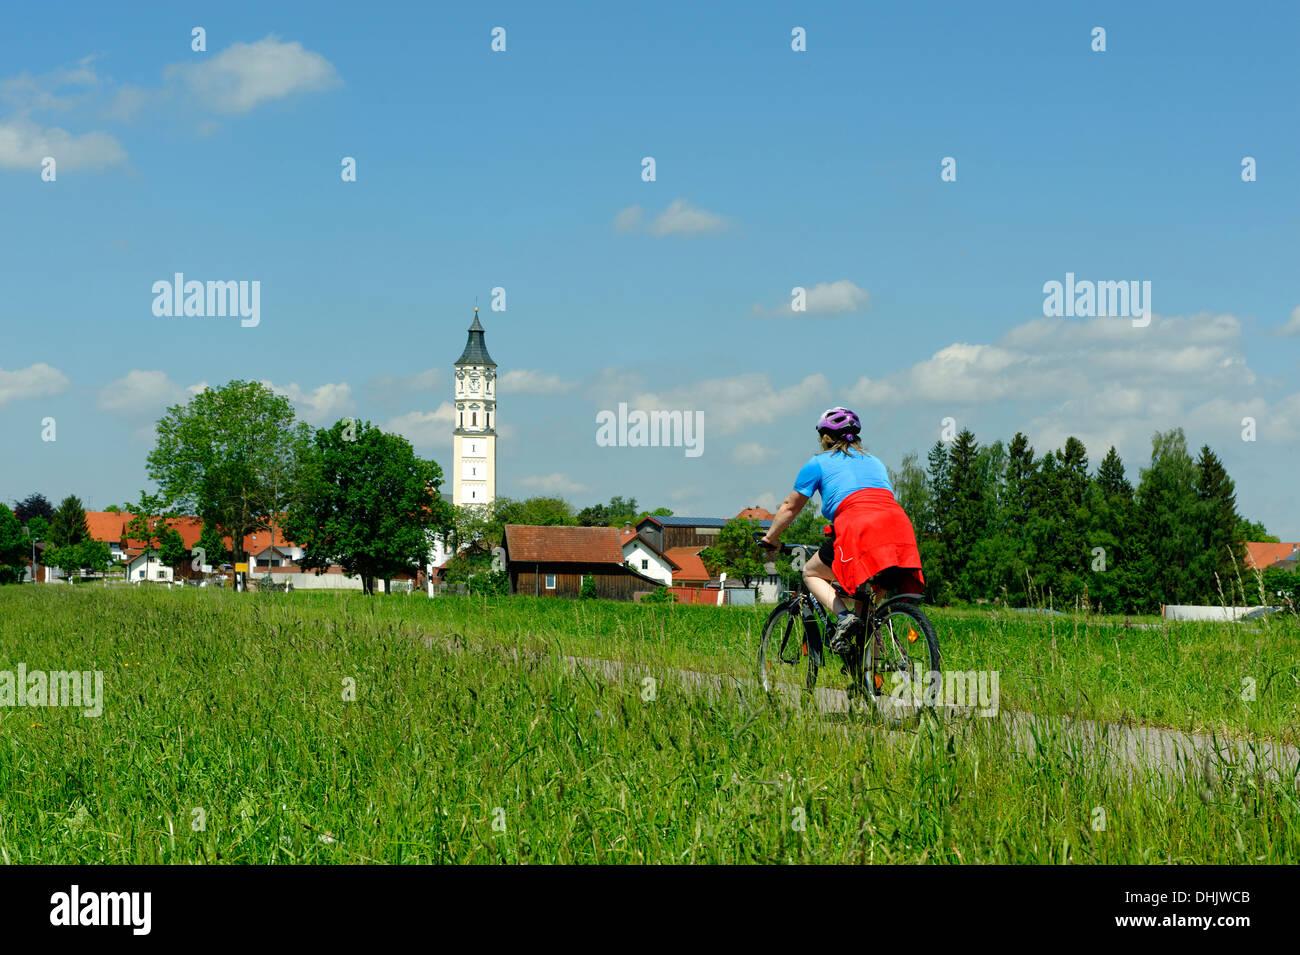 Germany, Bavaria, cyclist at Schlingen, near  Bad Woerishofen Stock Photo